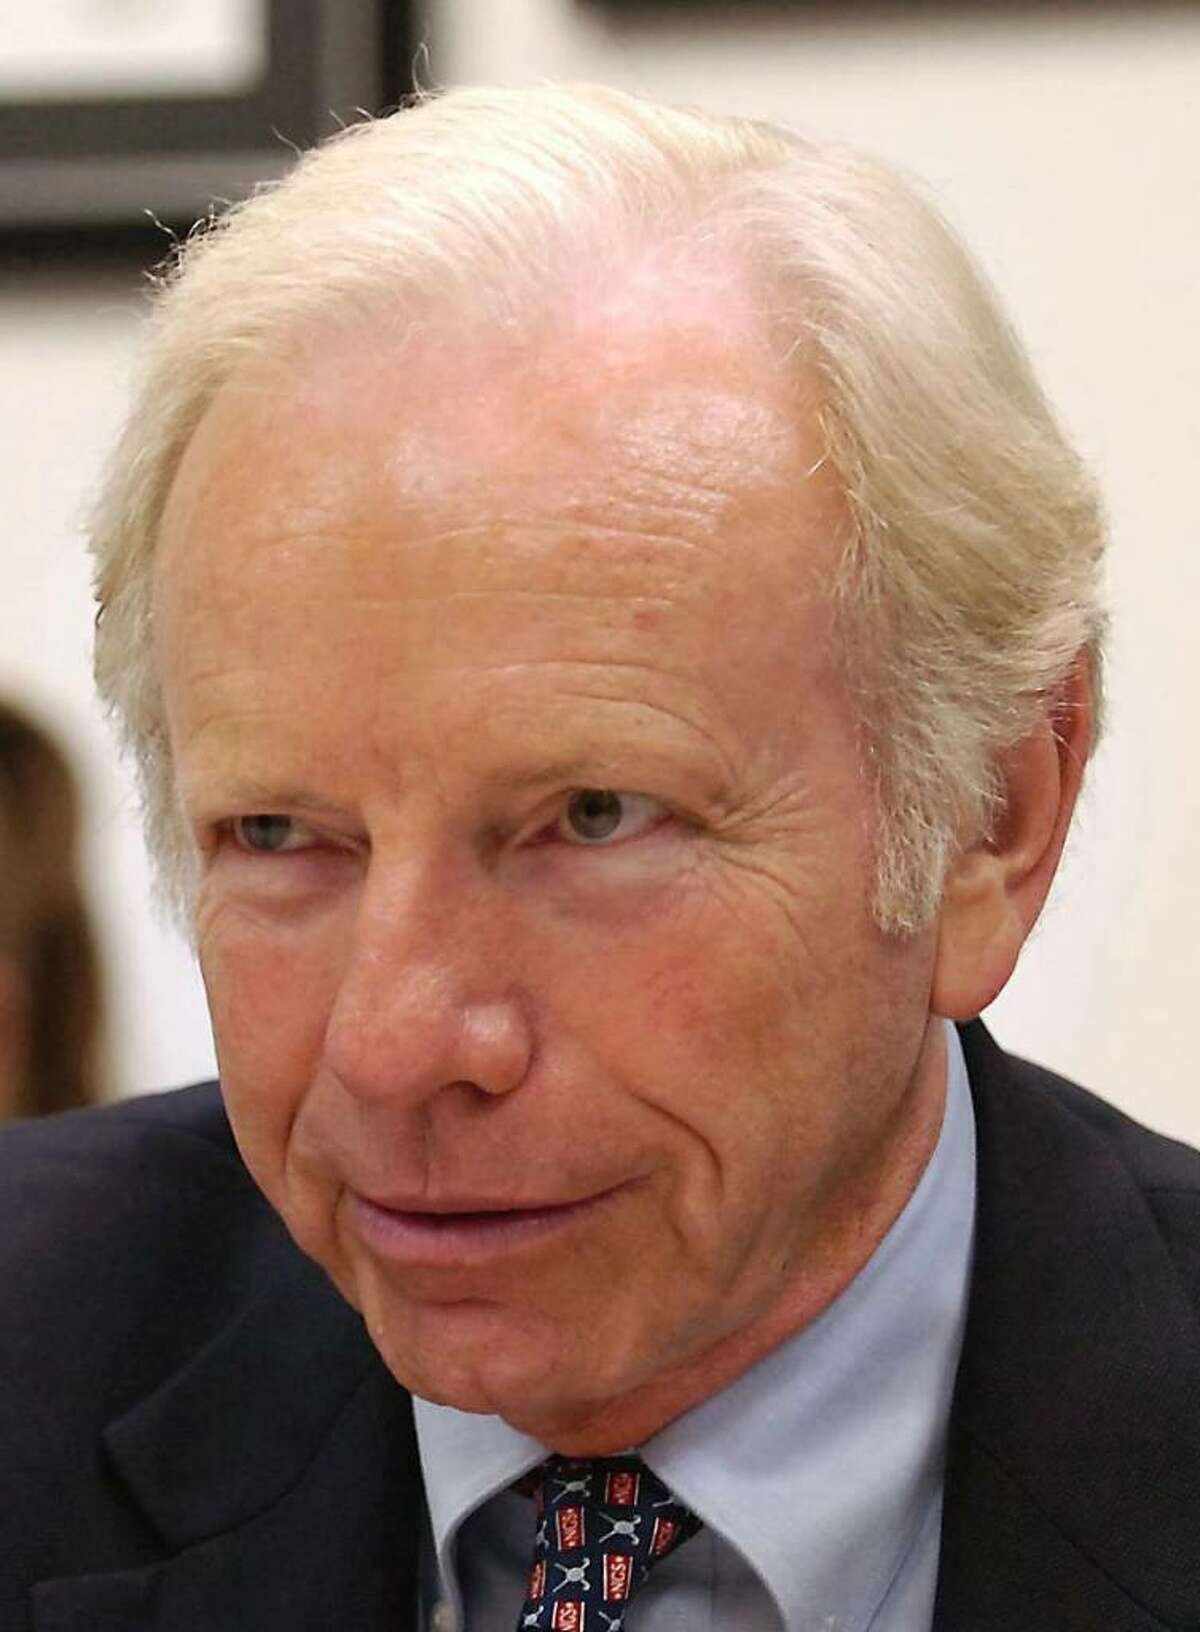 U.S. Sen. Joseph Lieberman is scheduled to hold a fundraiser for embattled Senate Majority Leader Harry Reid in Greenwich Sunday, May 2.